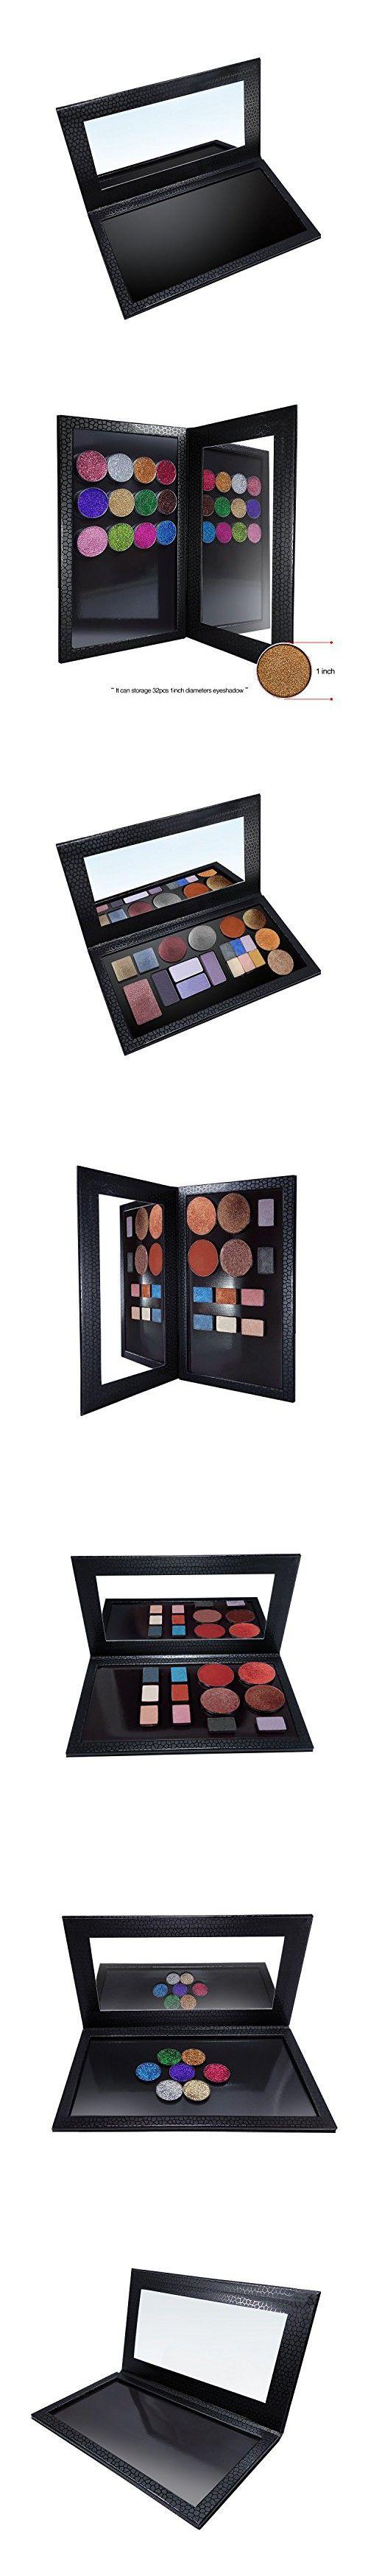 Allwon Palette Empty Eyeshadow Makeup Palette